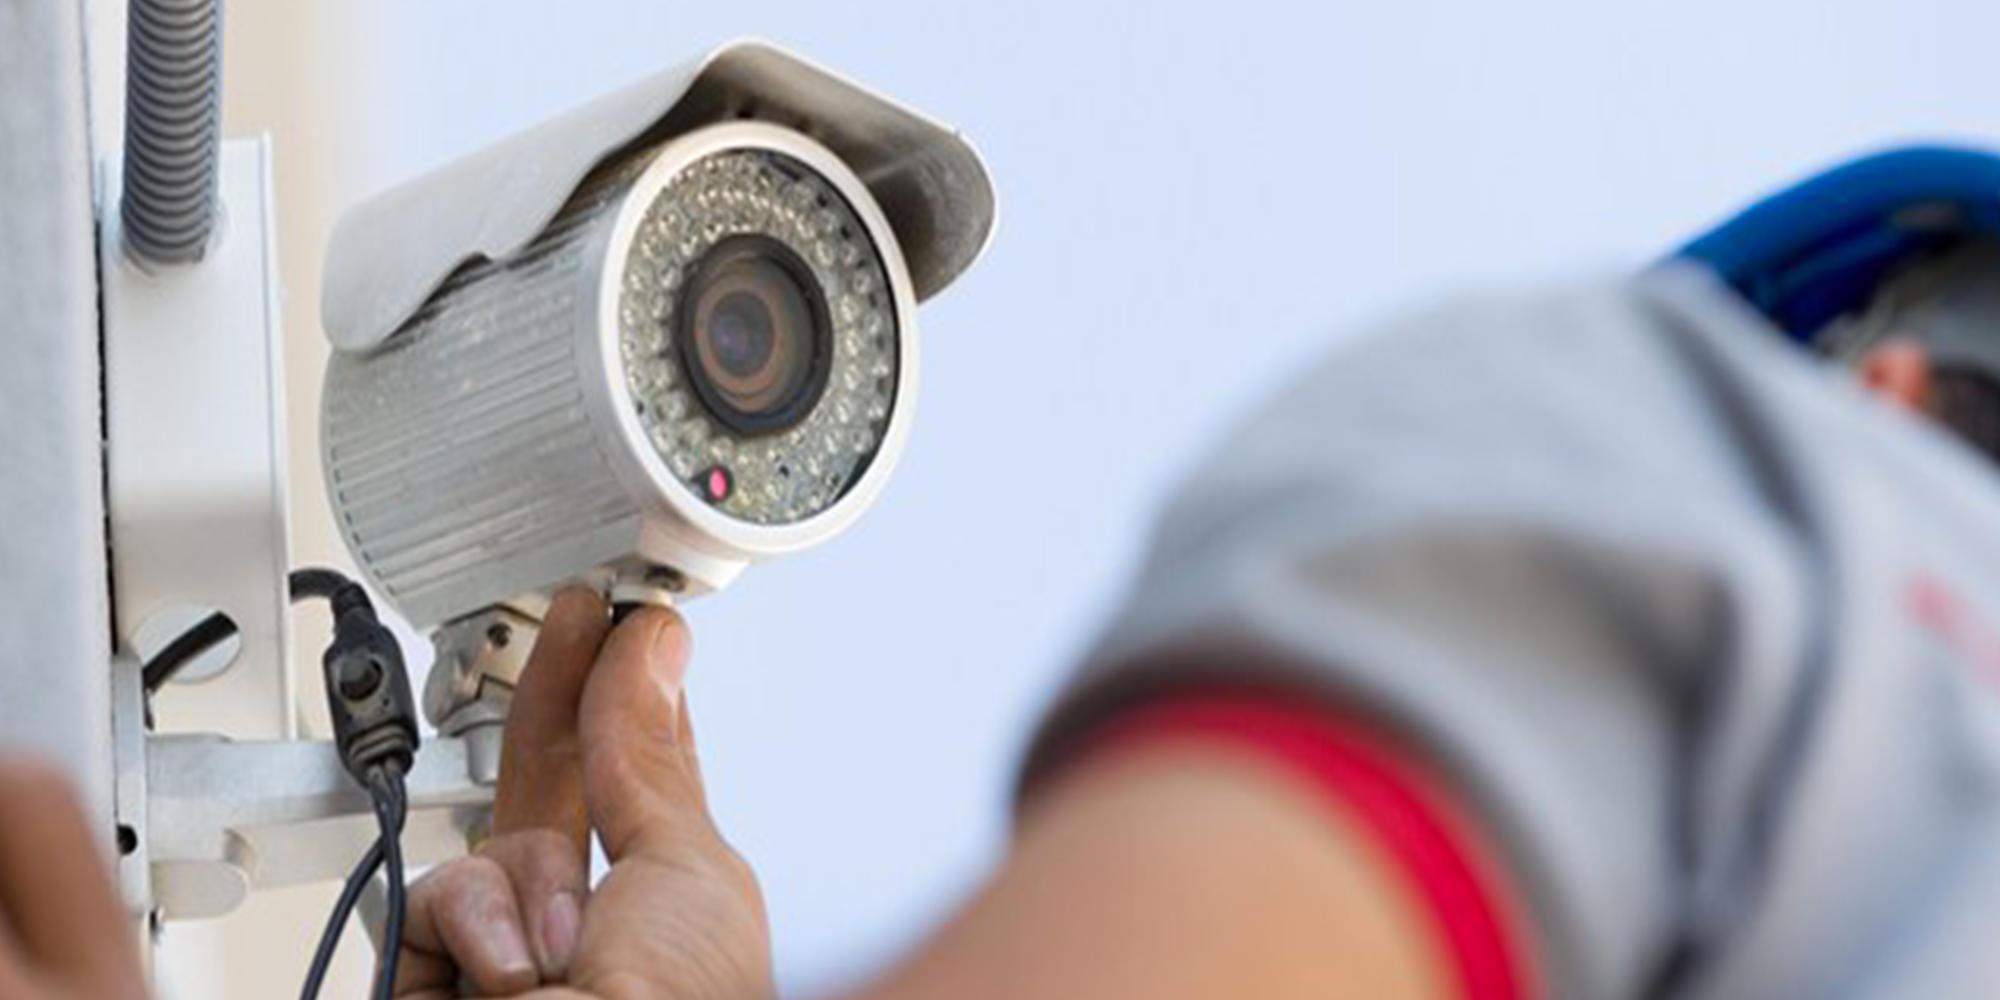 Où installer des caméras dans sa maison?